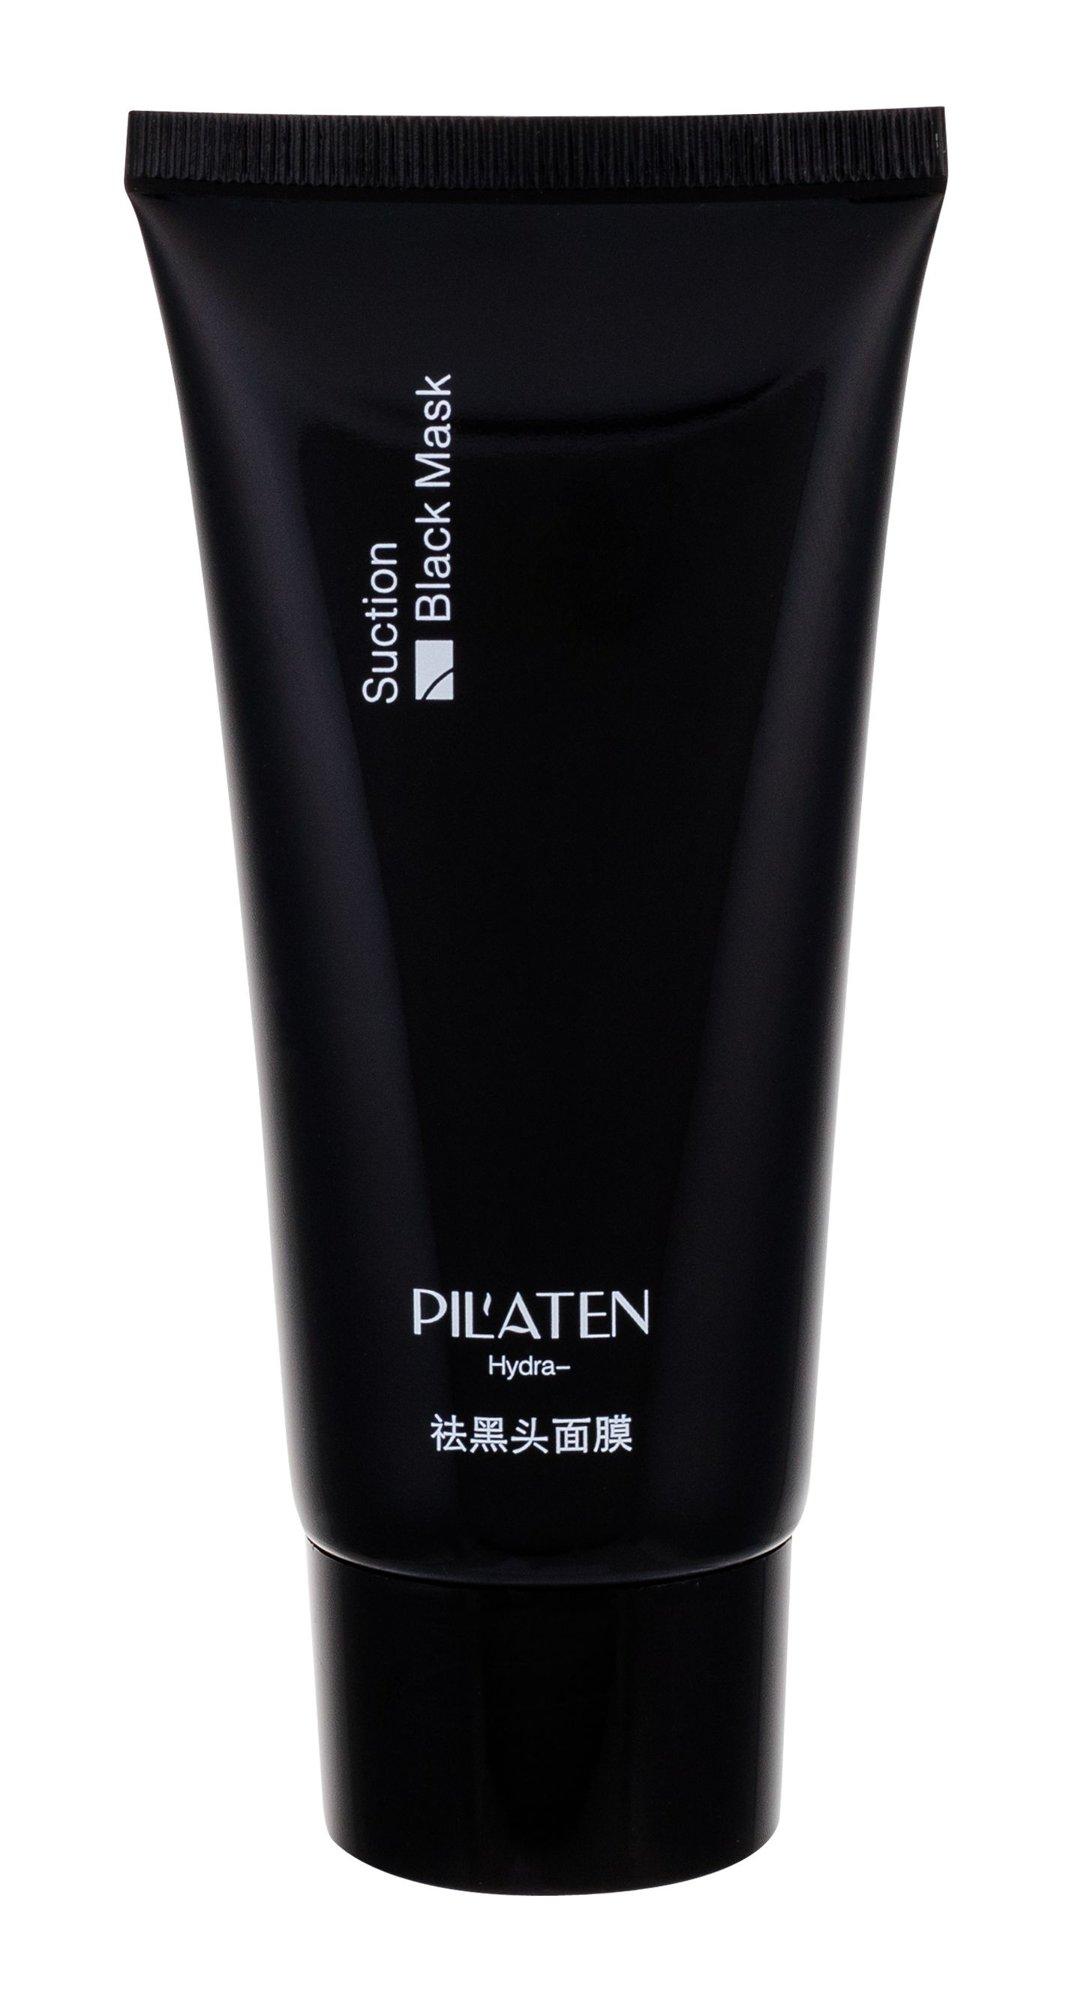 Pilaten Black Head Cosmetic 60ml